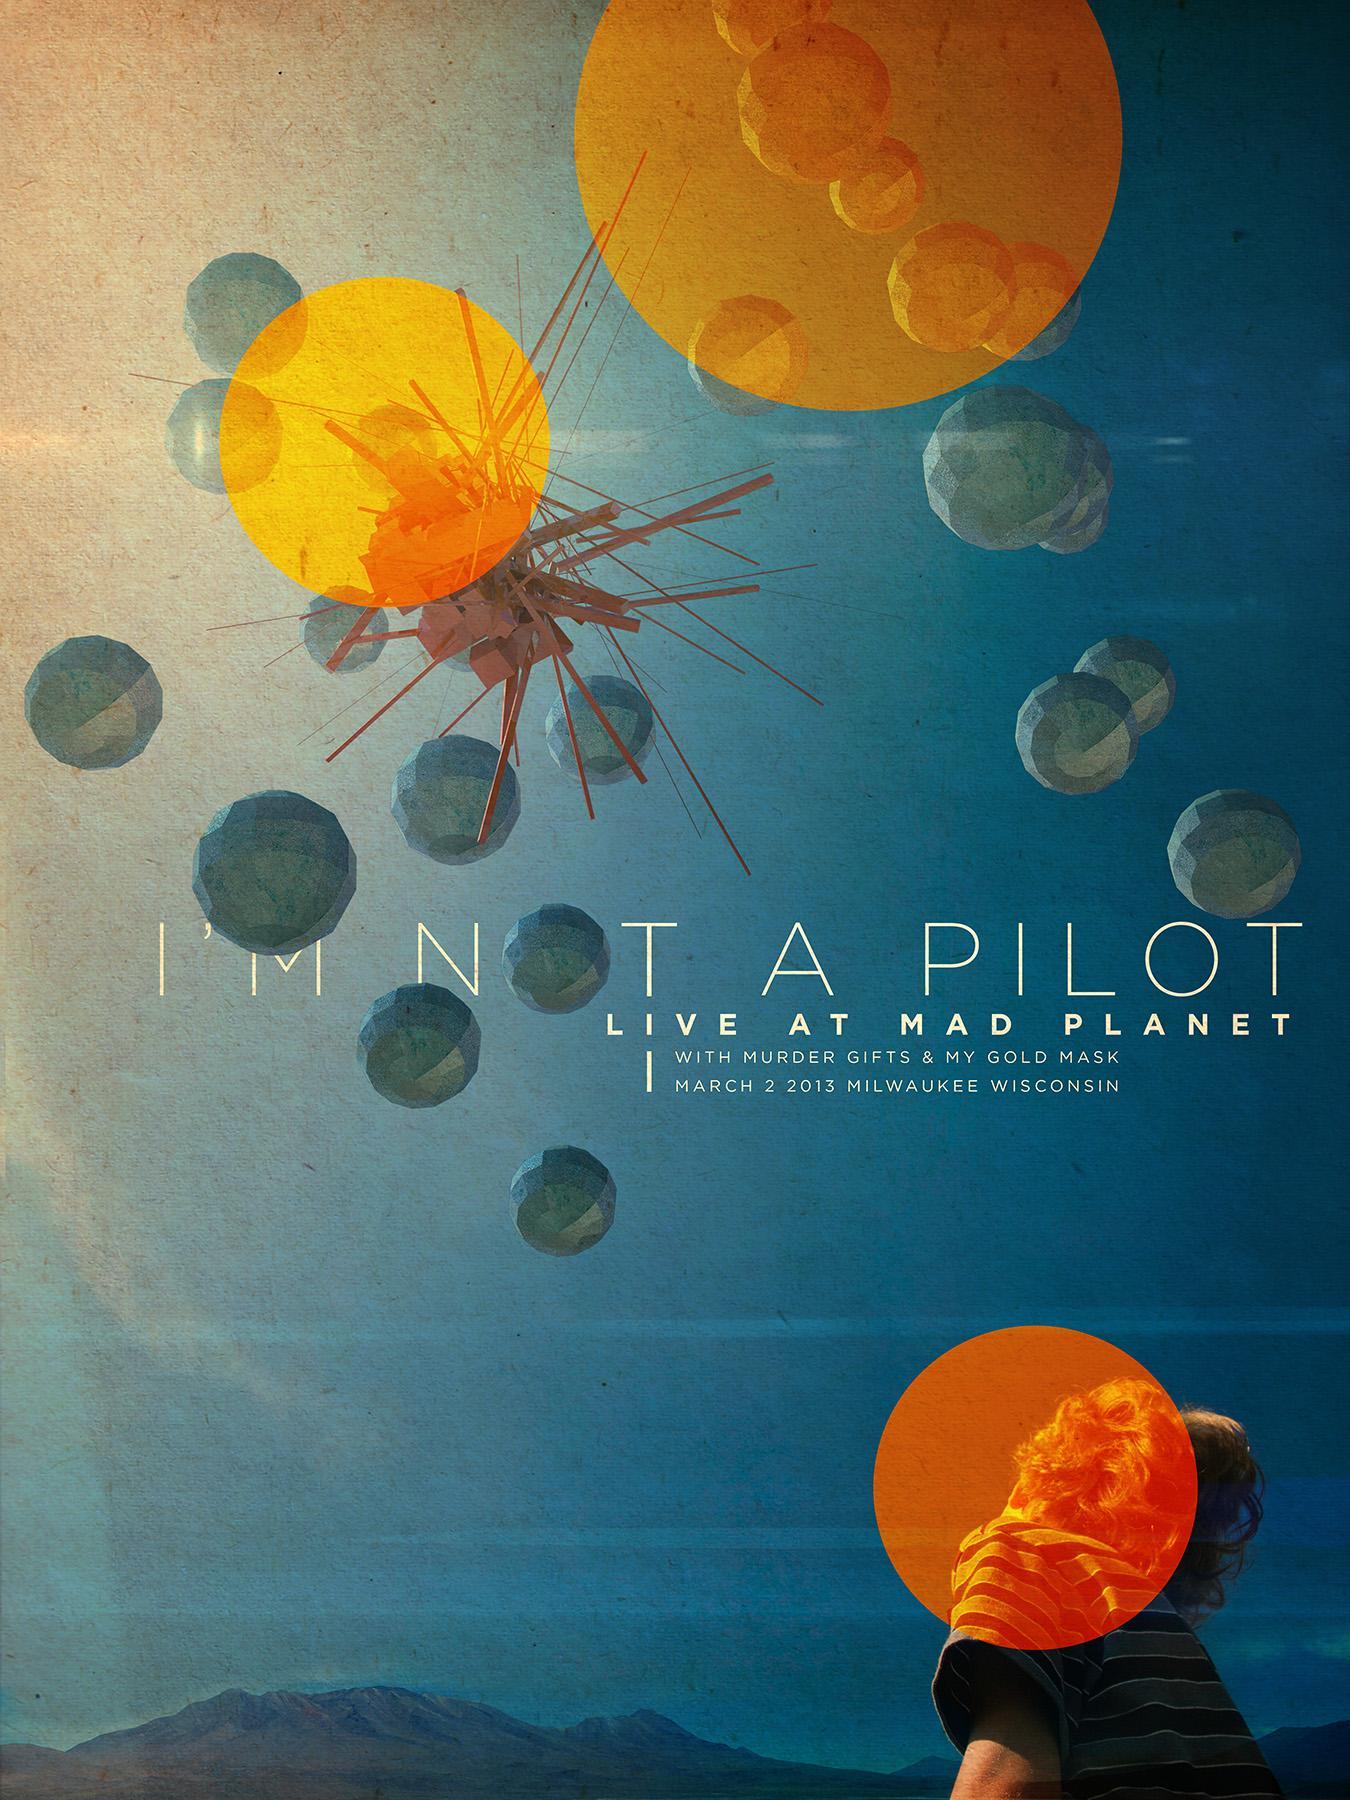 I'm Not a Pilot - Commemorative Show Poster - image 2 - student project